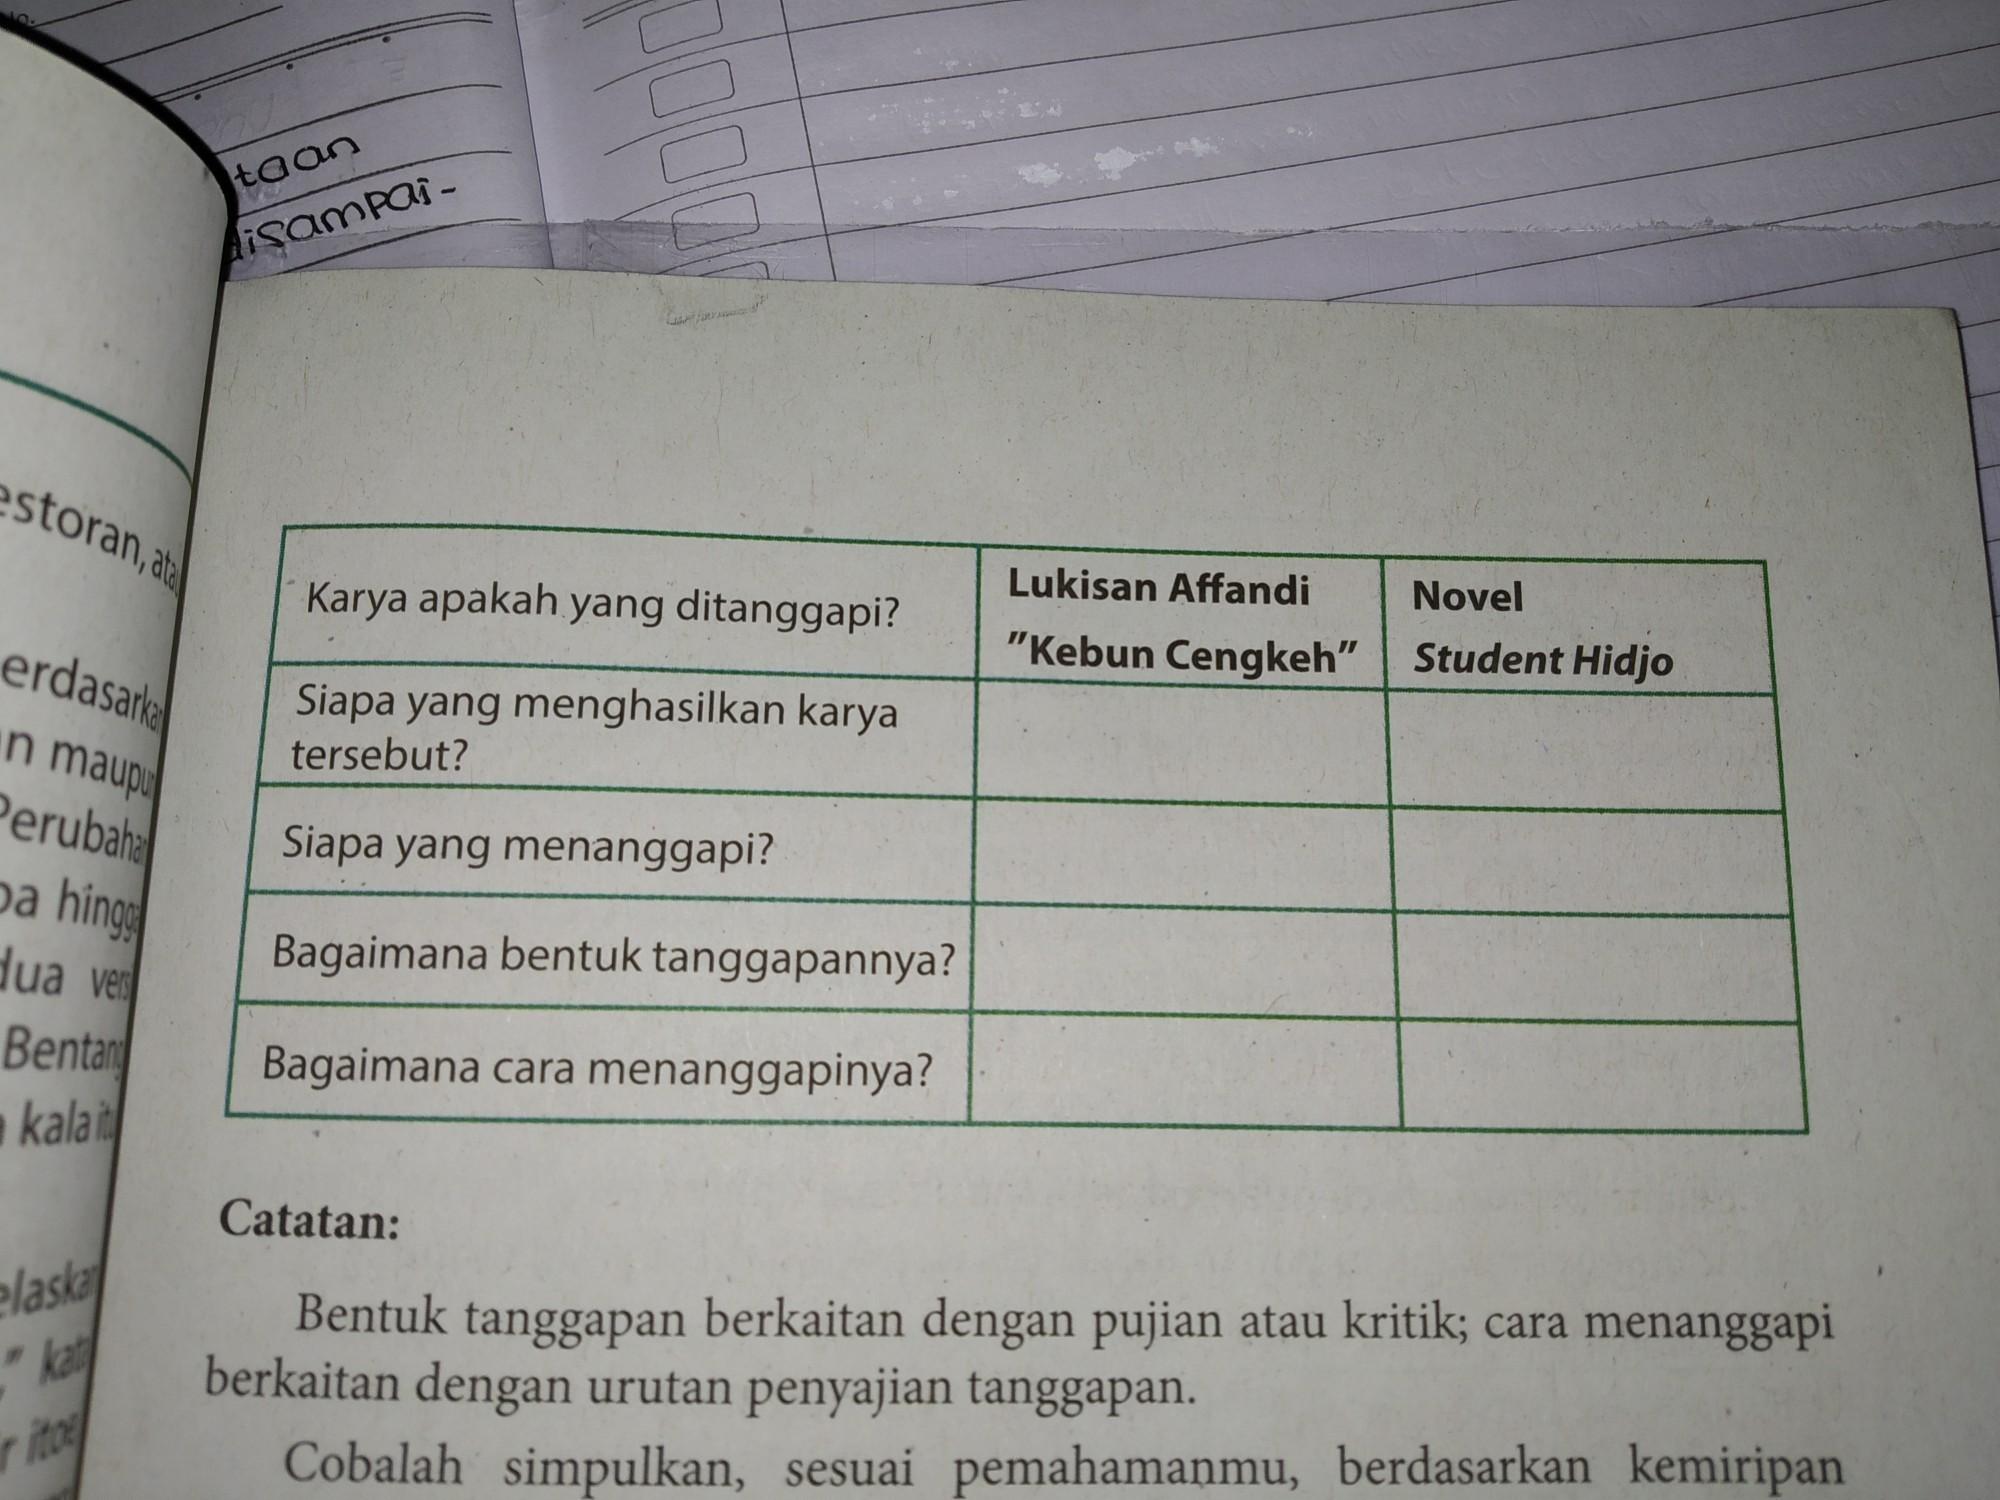 Itu Paket Indo Kls 9 Hal 93 Yaa Kawan Brainly Co Id